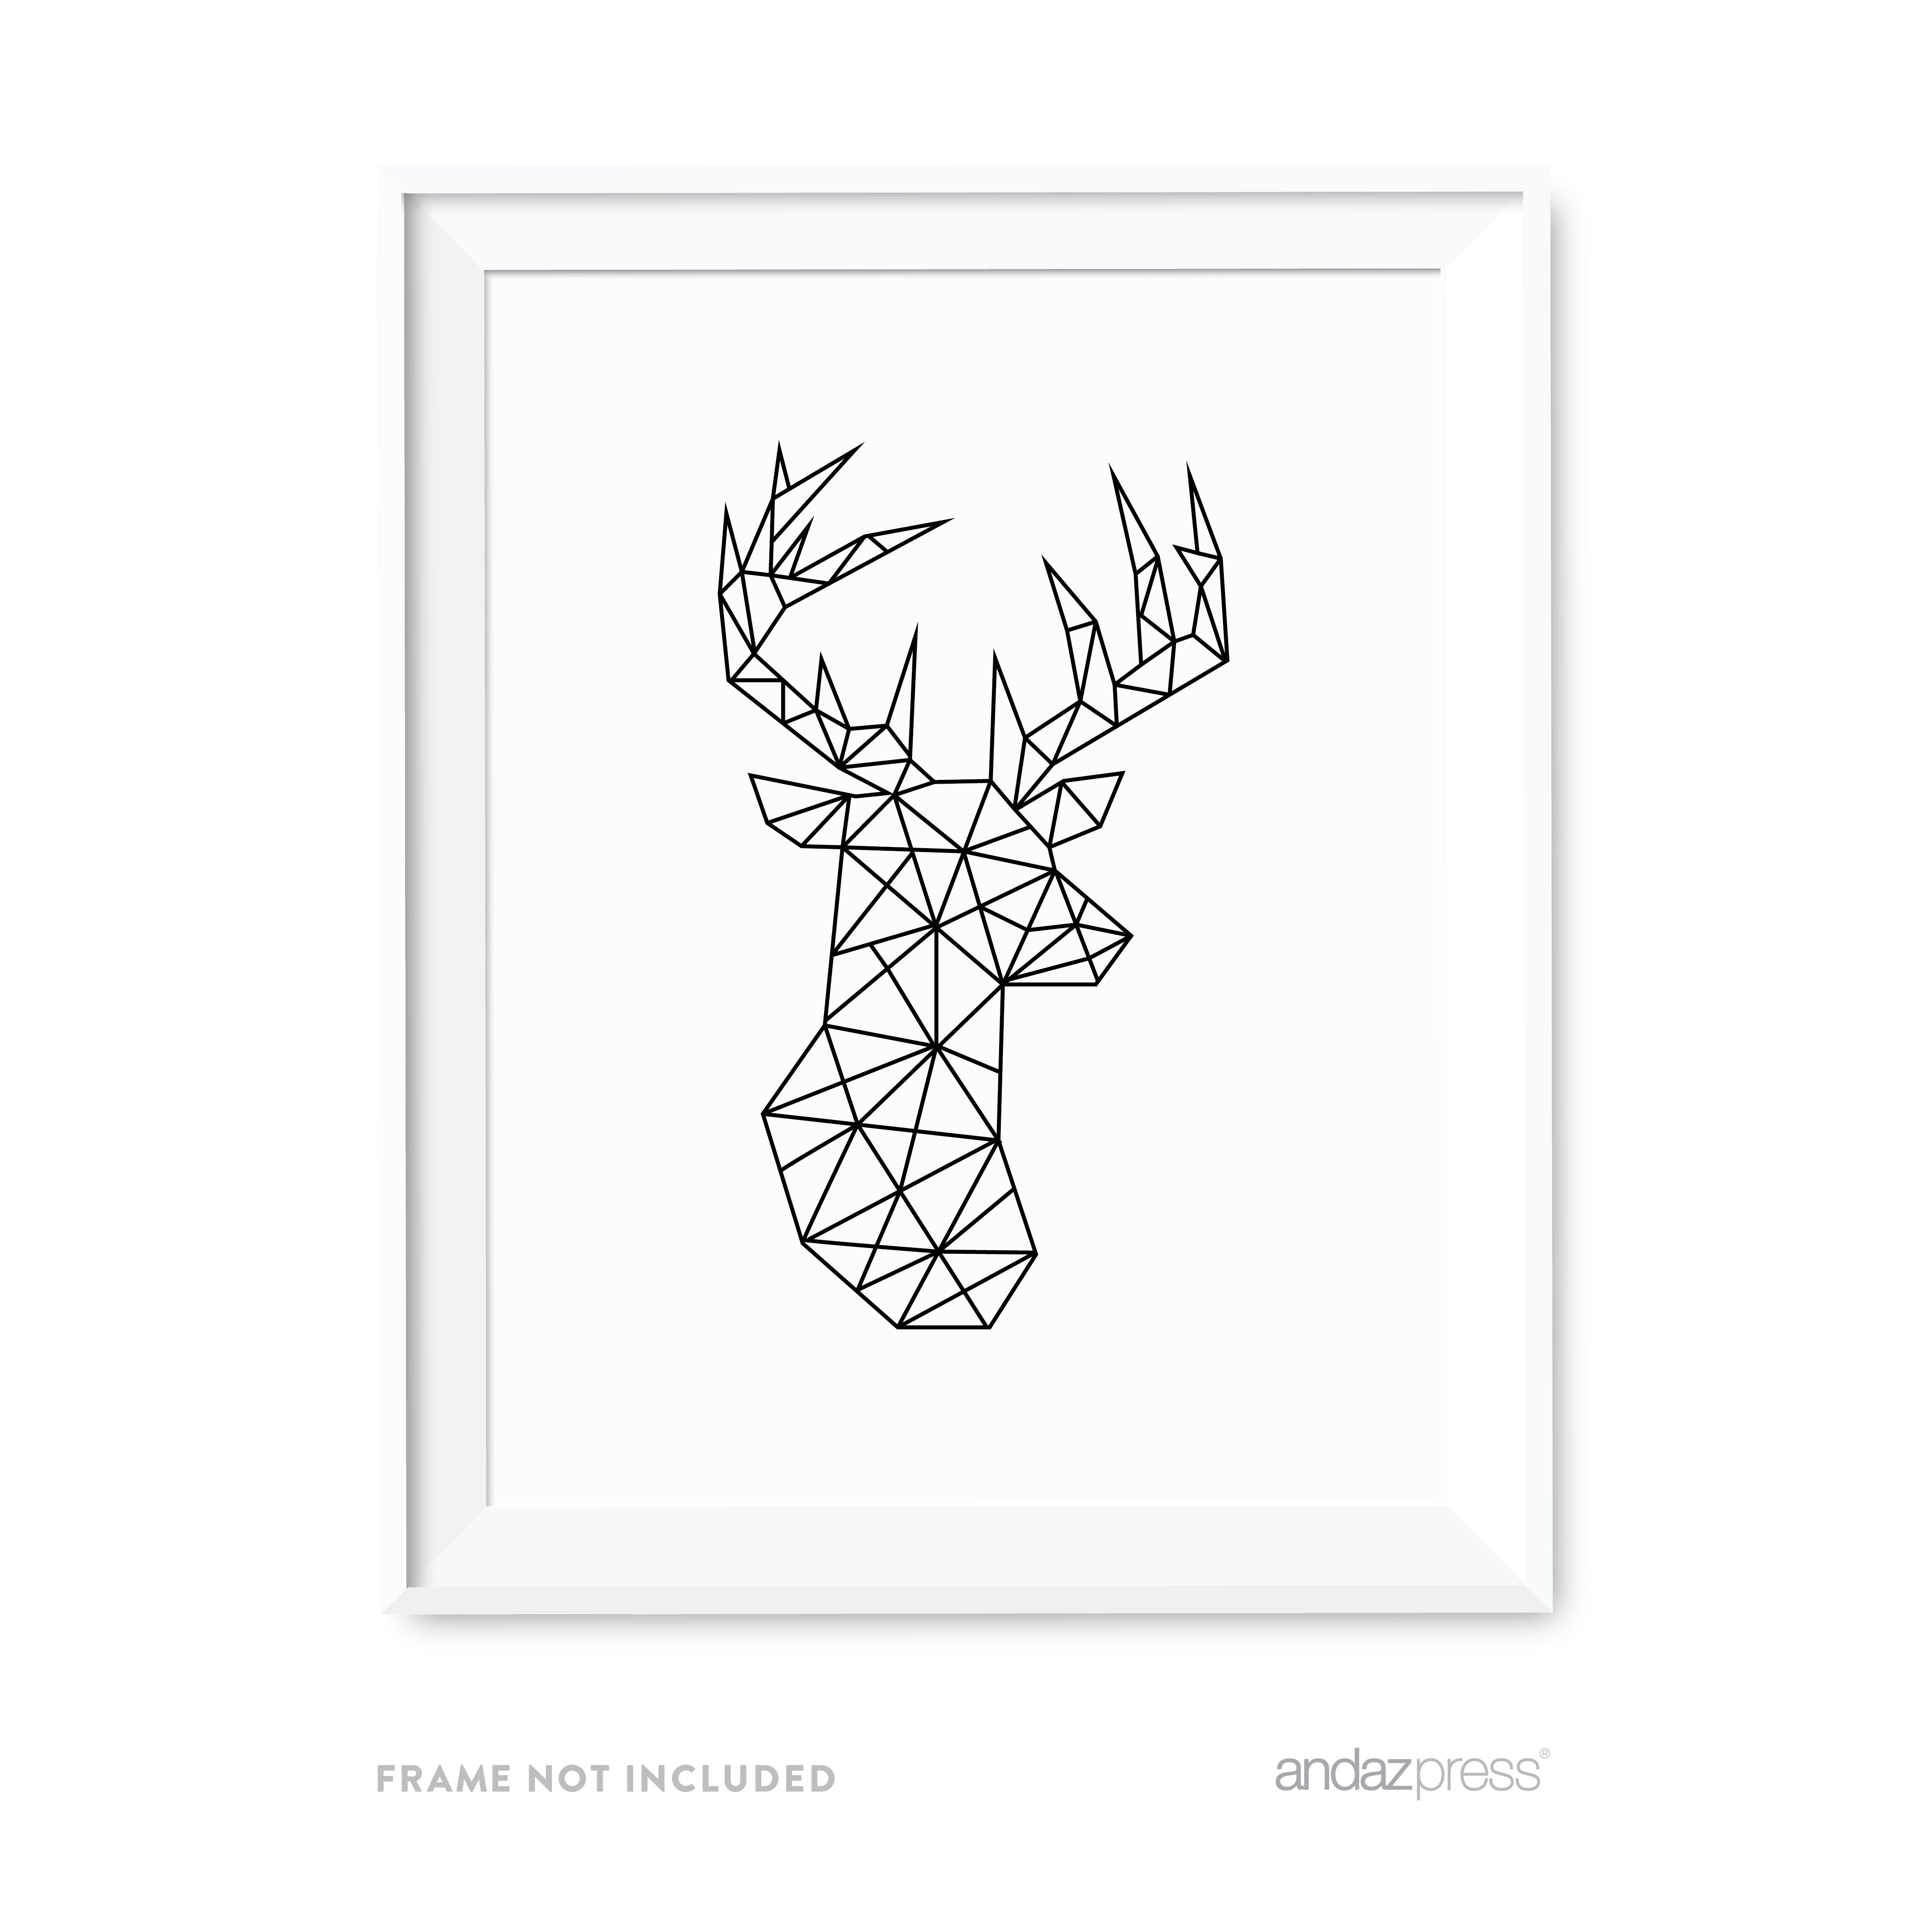 Deer Geometric Animal Origami Wall Art Black White Minimalist Print